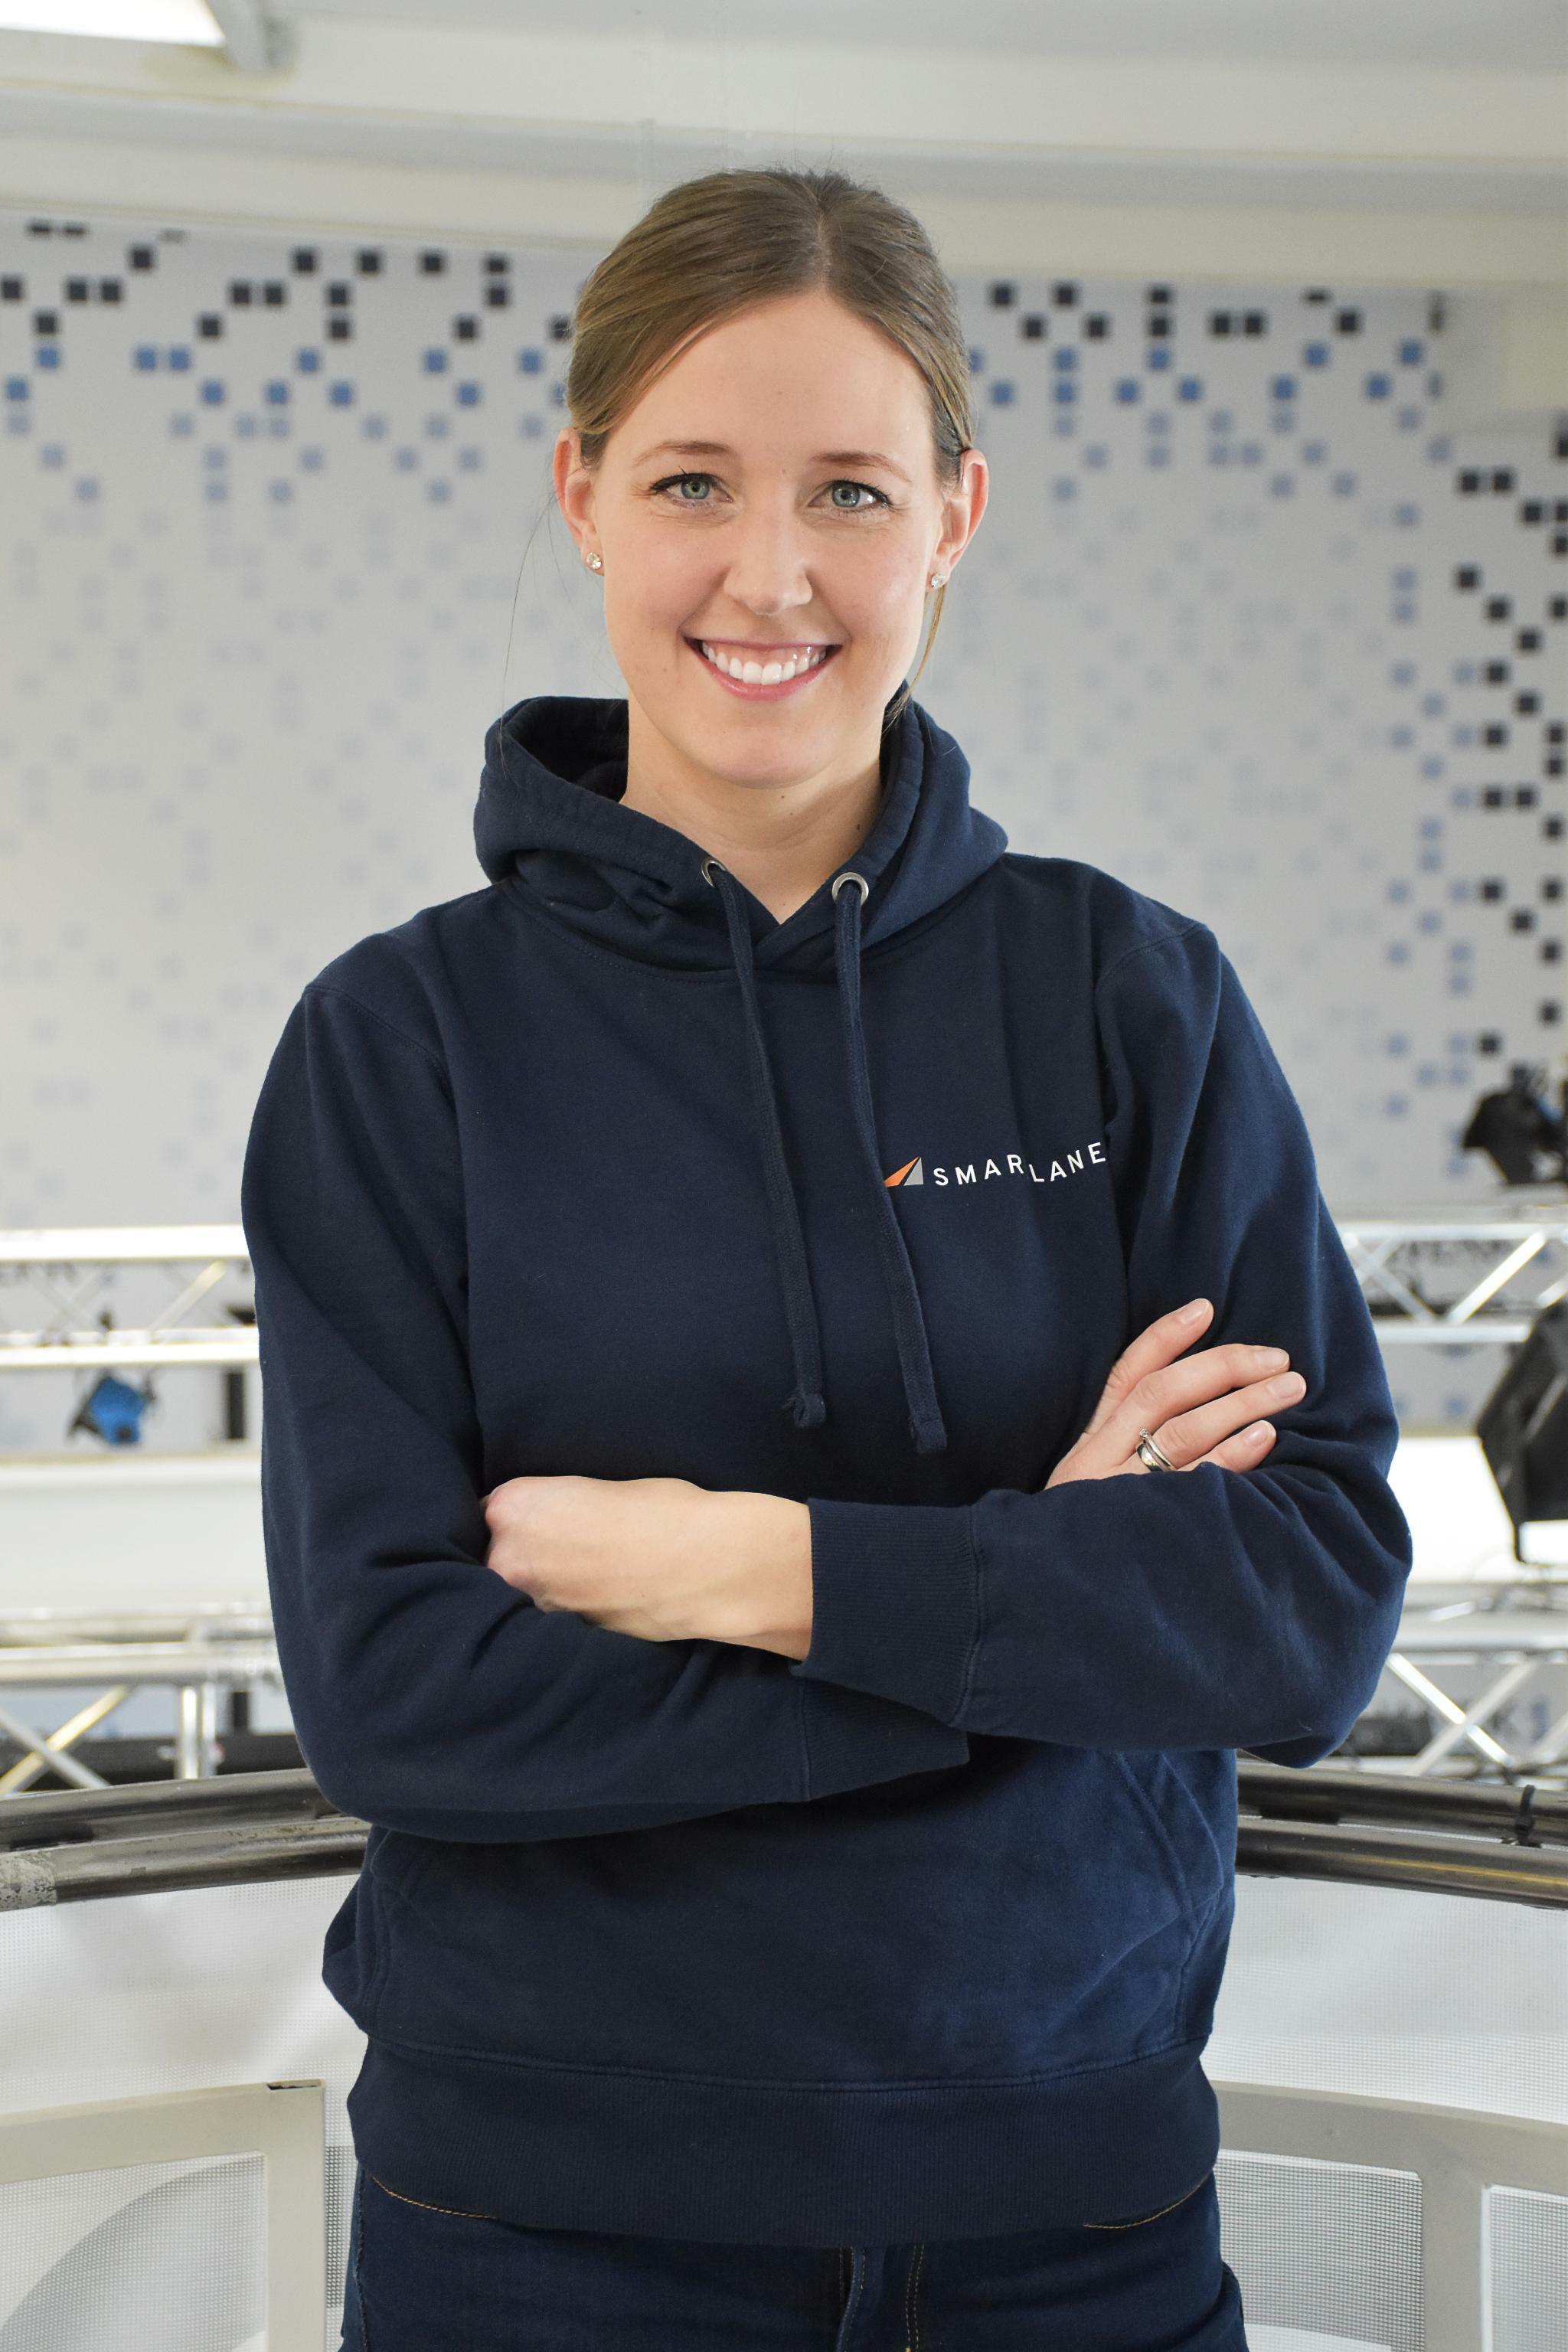 Smartlane-CEO Monja Mühling im Podcast Handelsblatt Disrupt